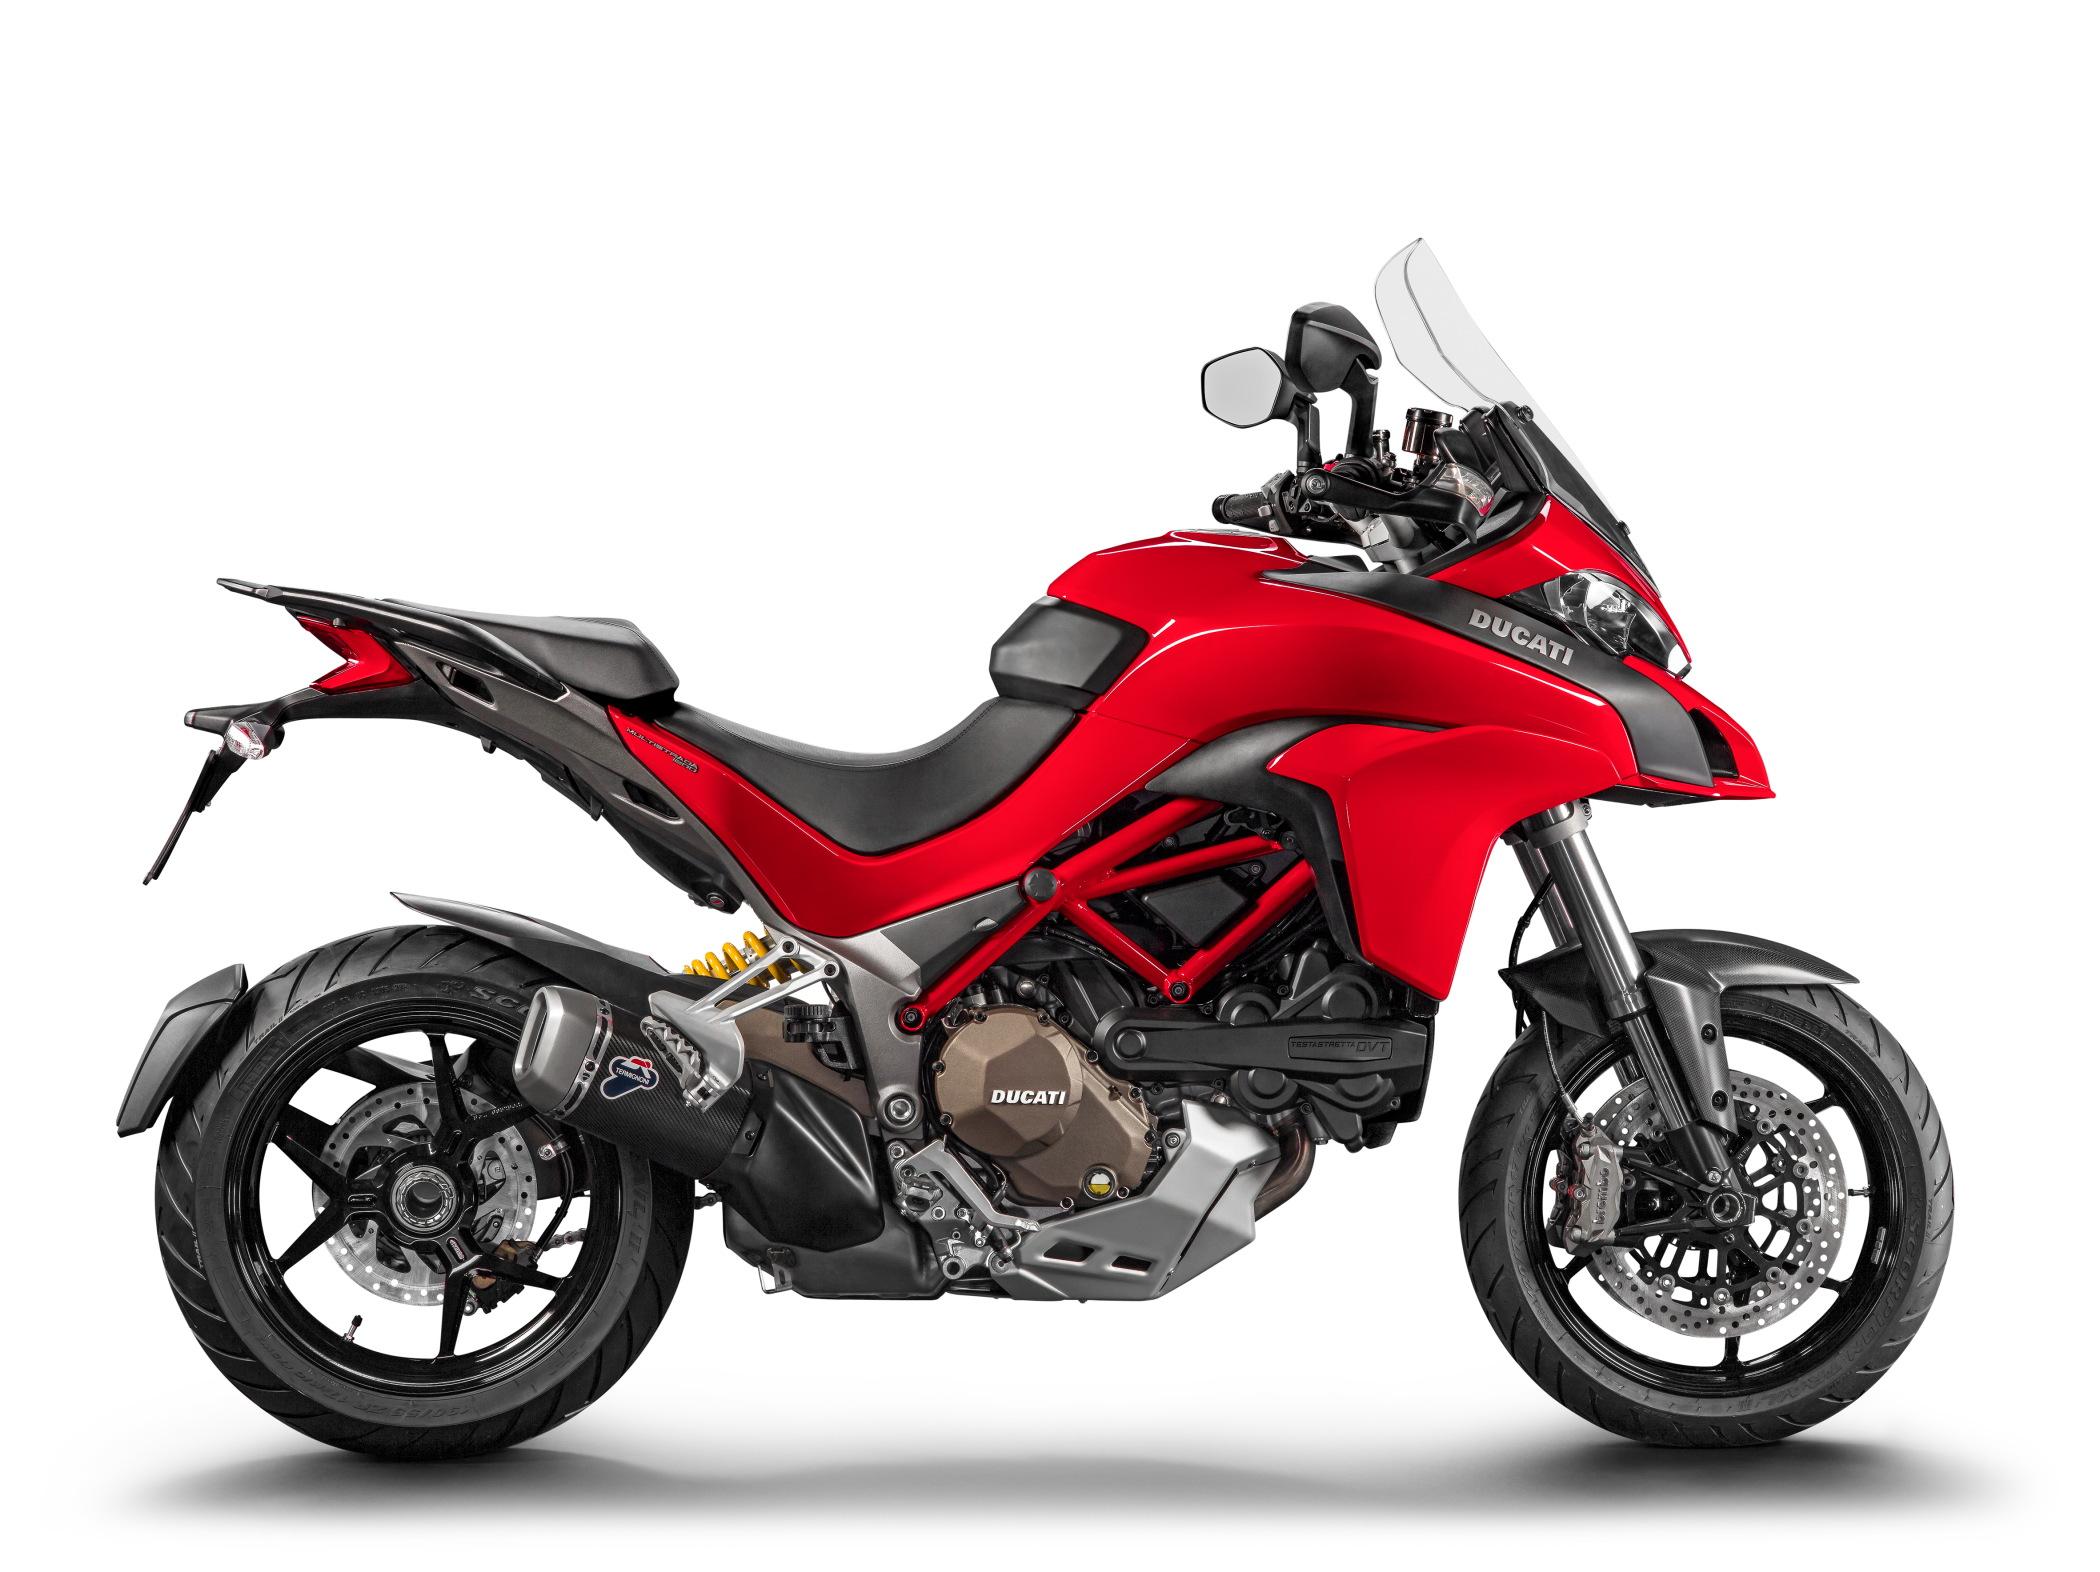 Ducati Multistrada 1200 Enduro Pro for Sale UK - Ducati